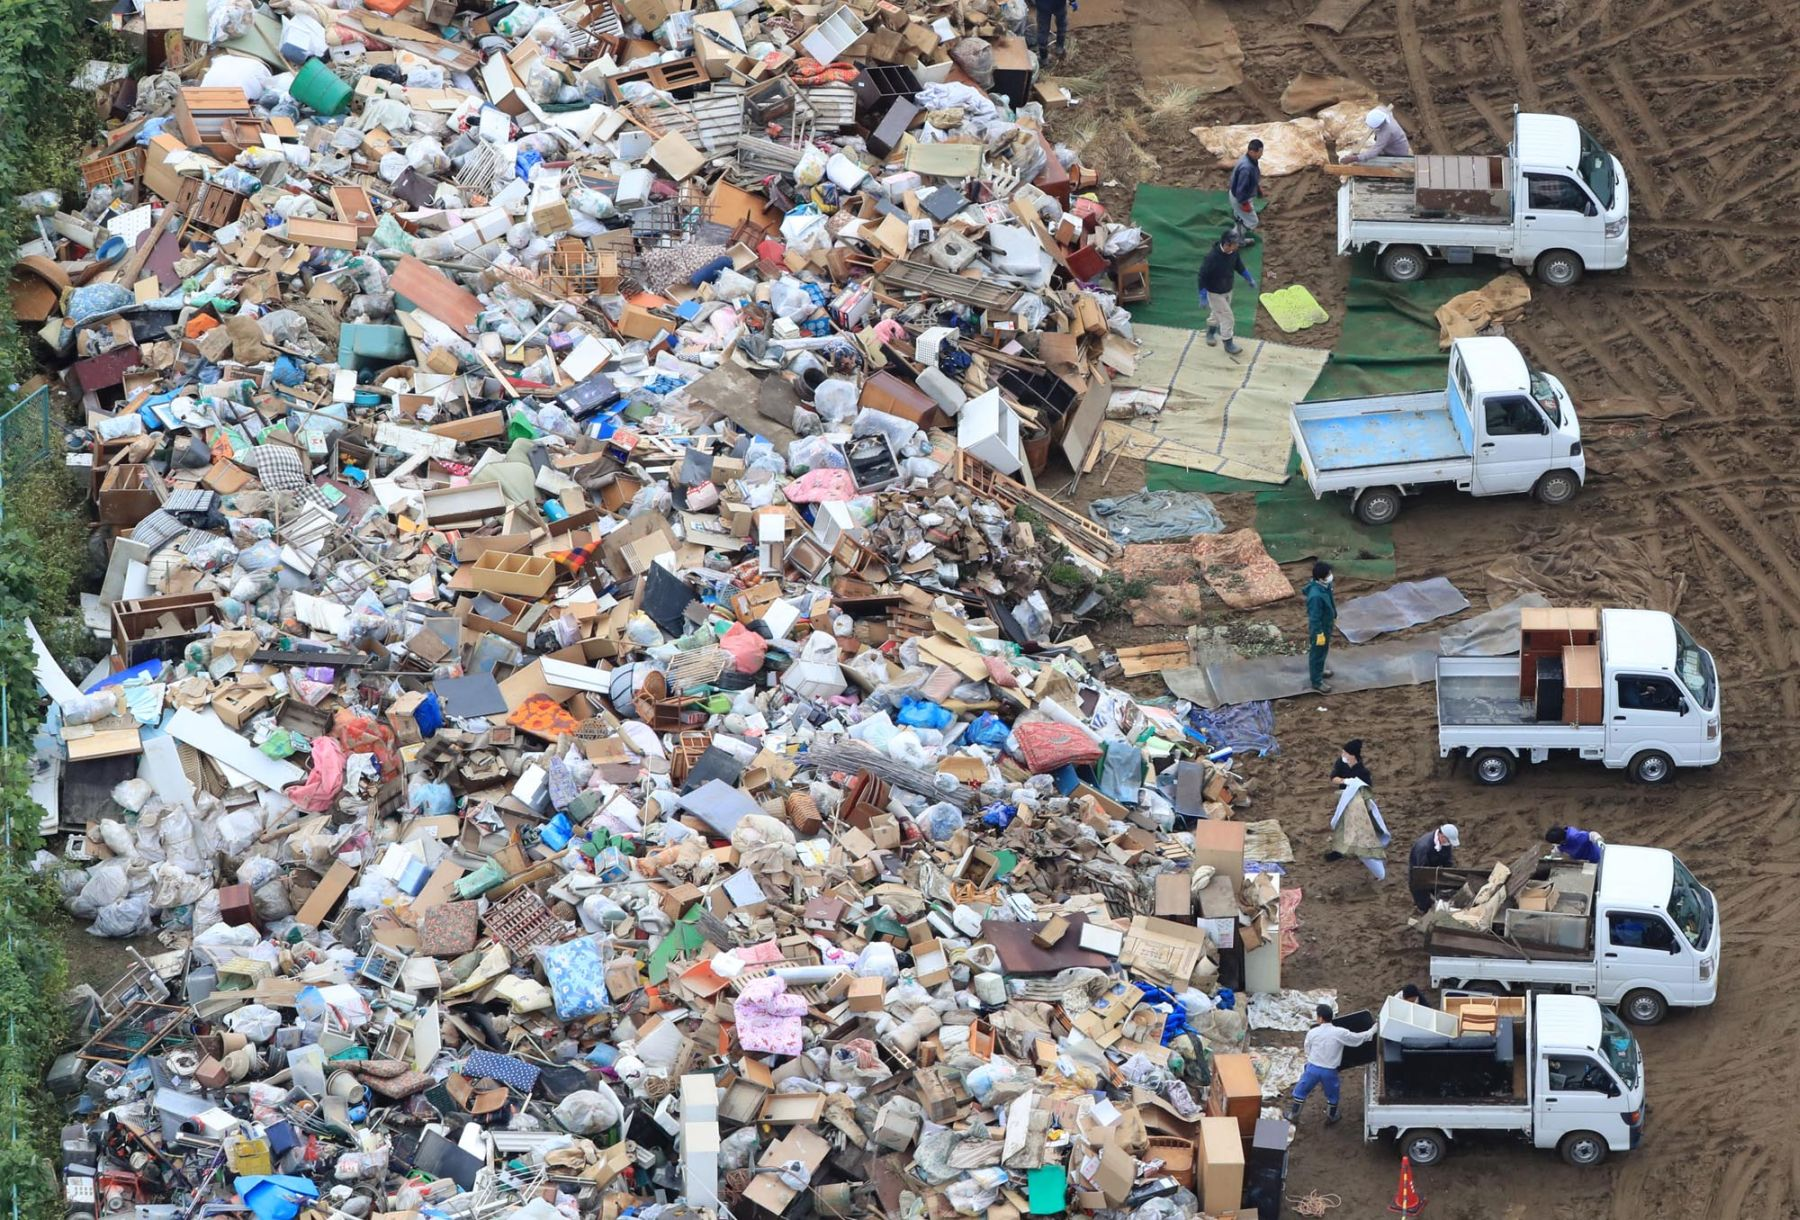 Aftermath of Super Typhoon Hagibis in Japan